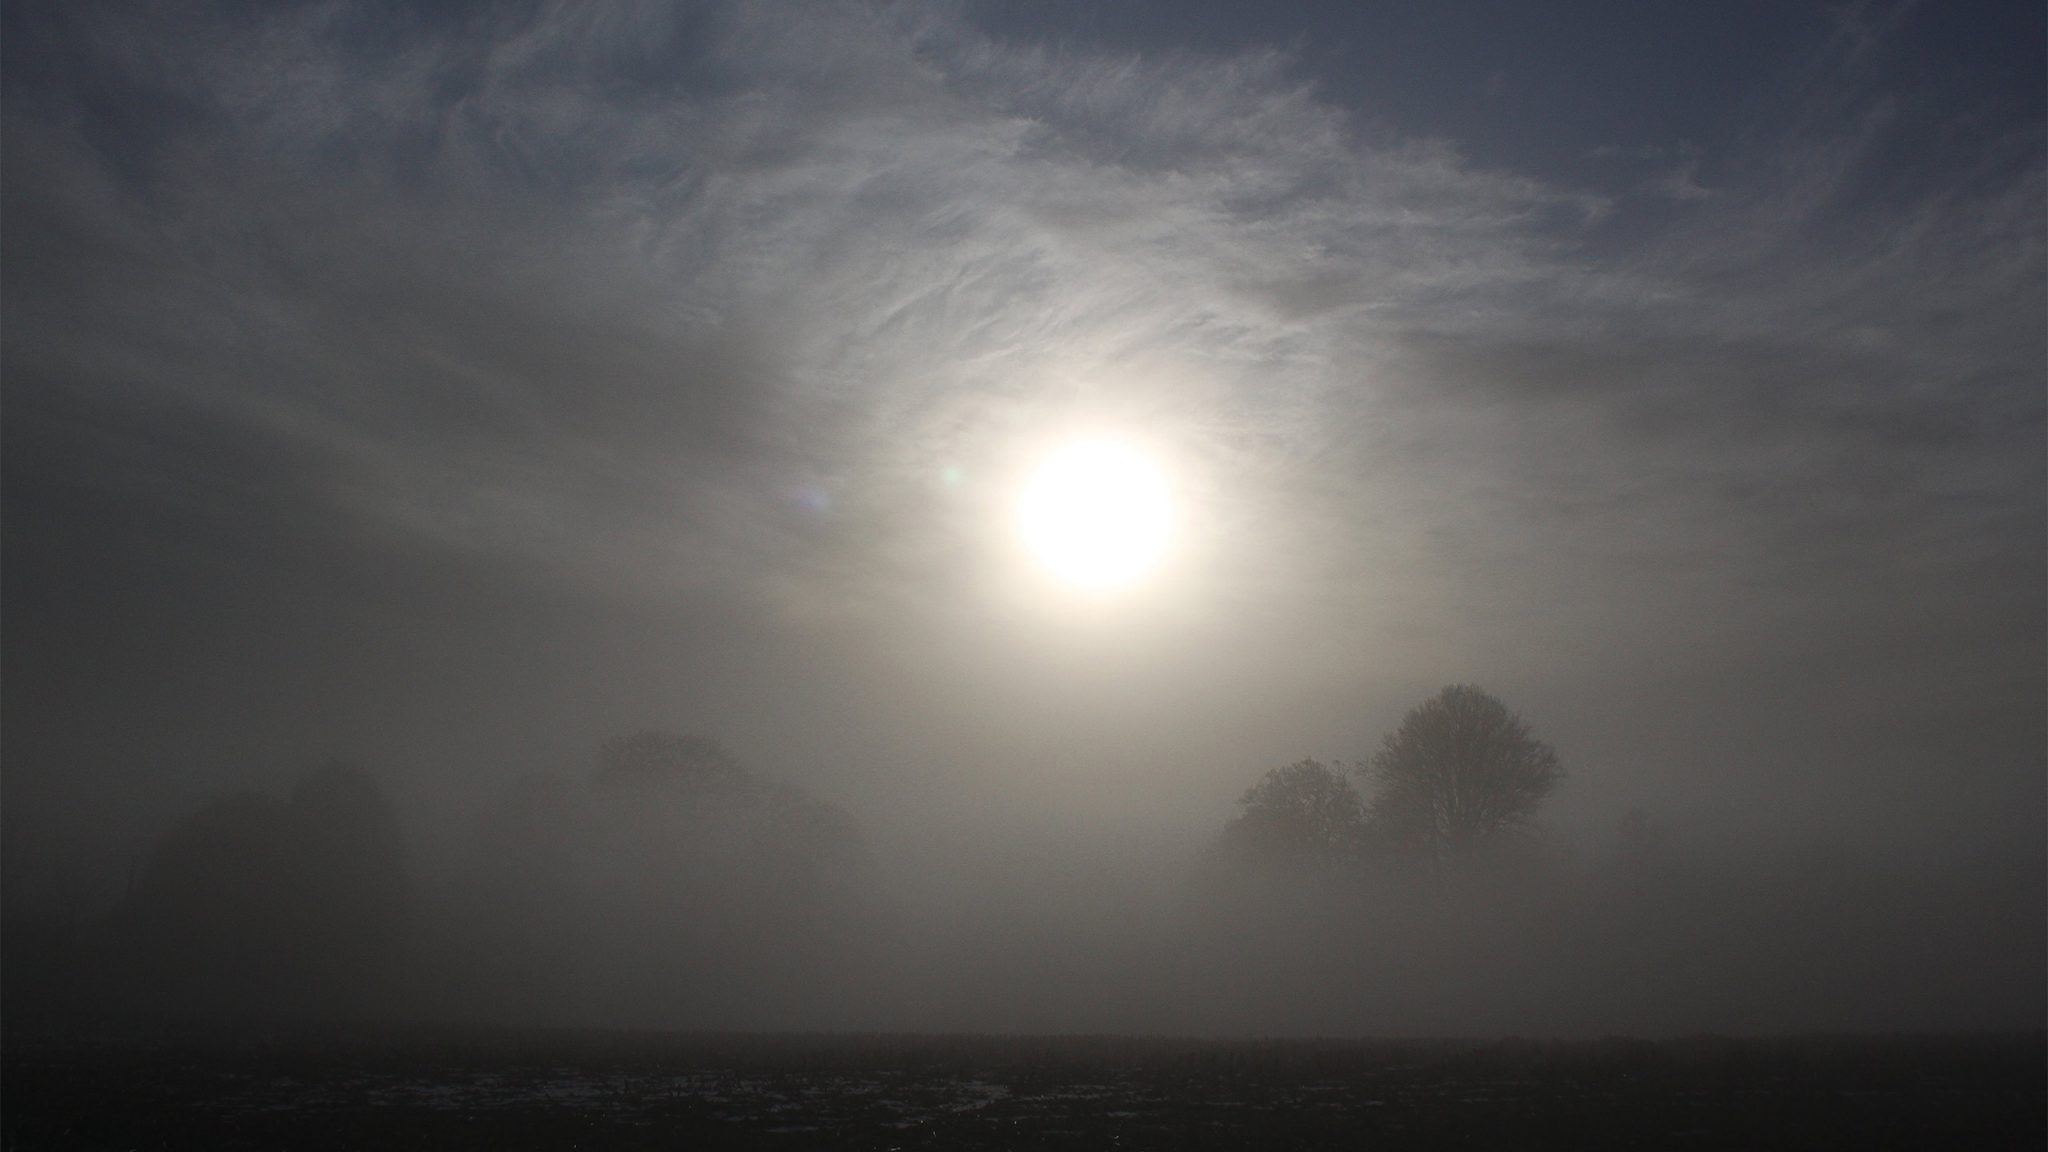 Misty Day above the River Dart, Tuckenhay, Devon, England.